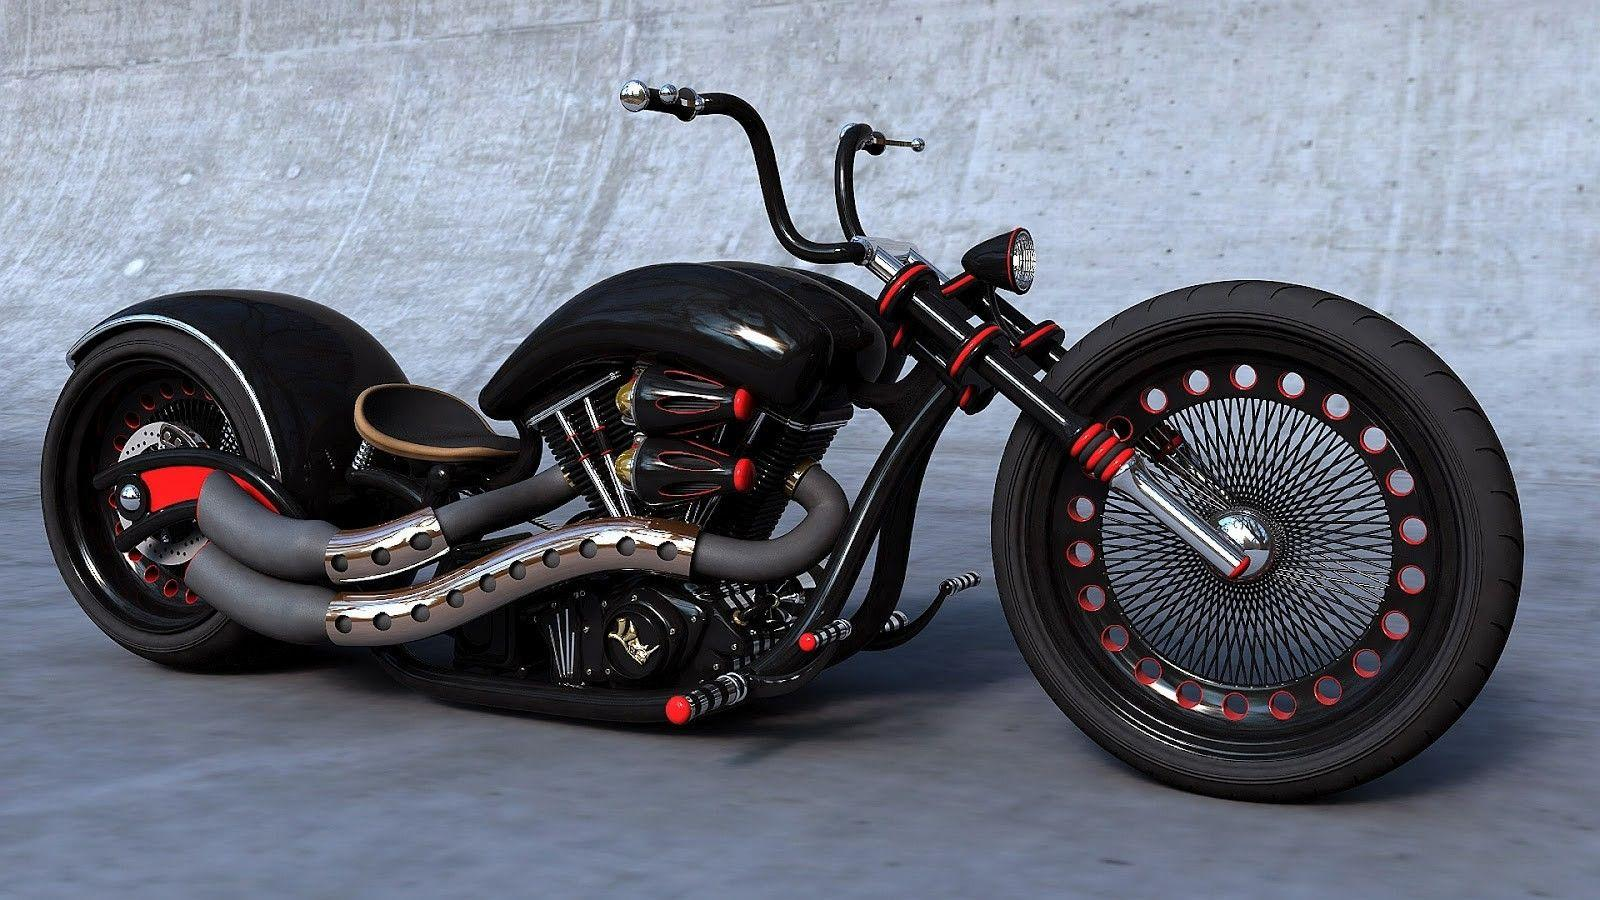 american chopper bikes wallpapers hd - wallpaper cave